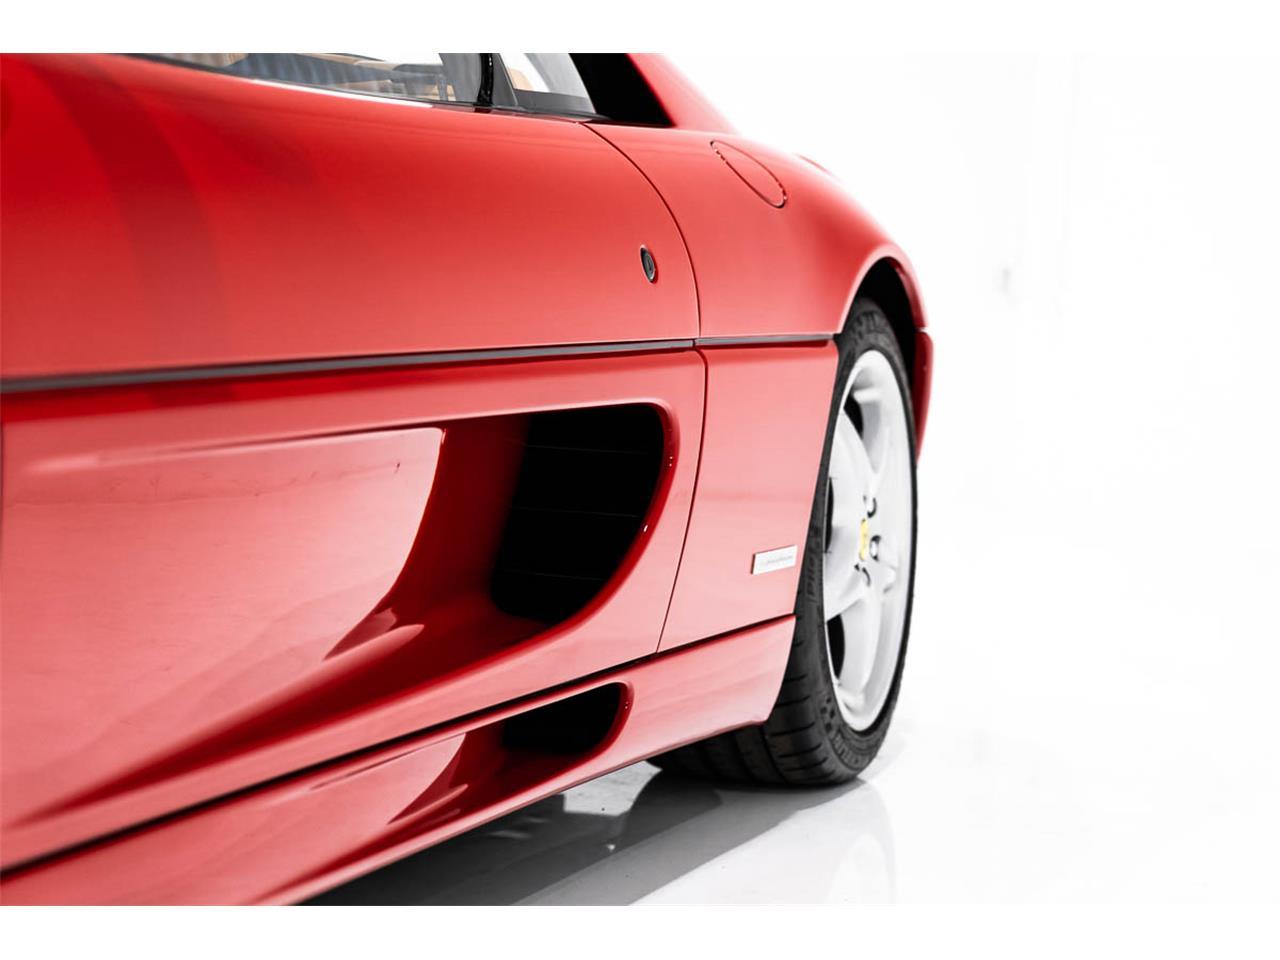 1997 Ferrari F355 Berlinetta (CC-1411663) for sale in Montreal, Quebec